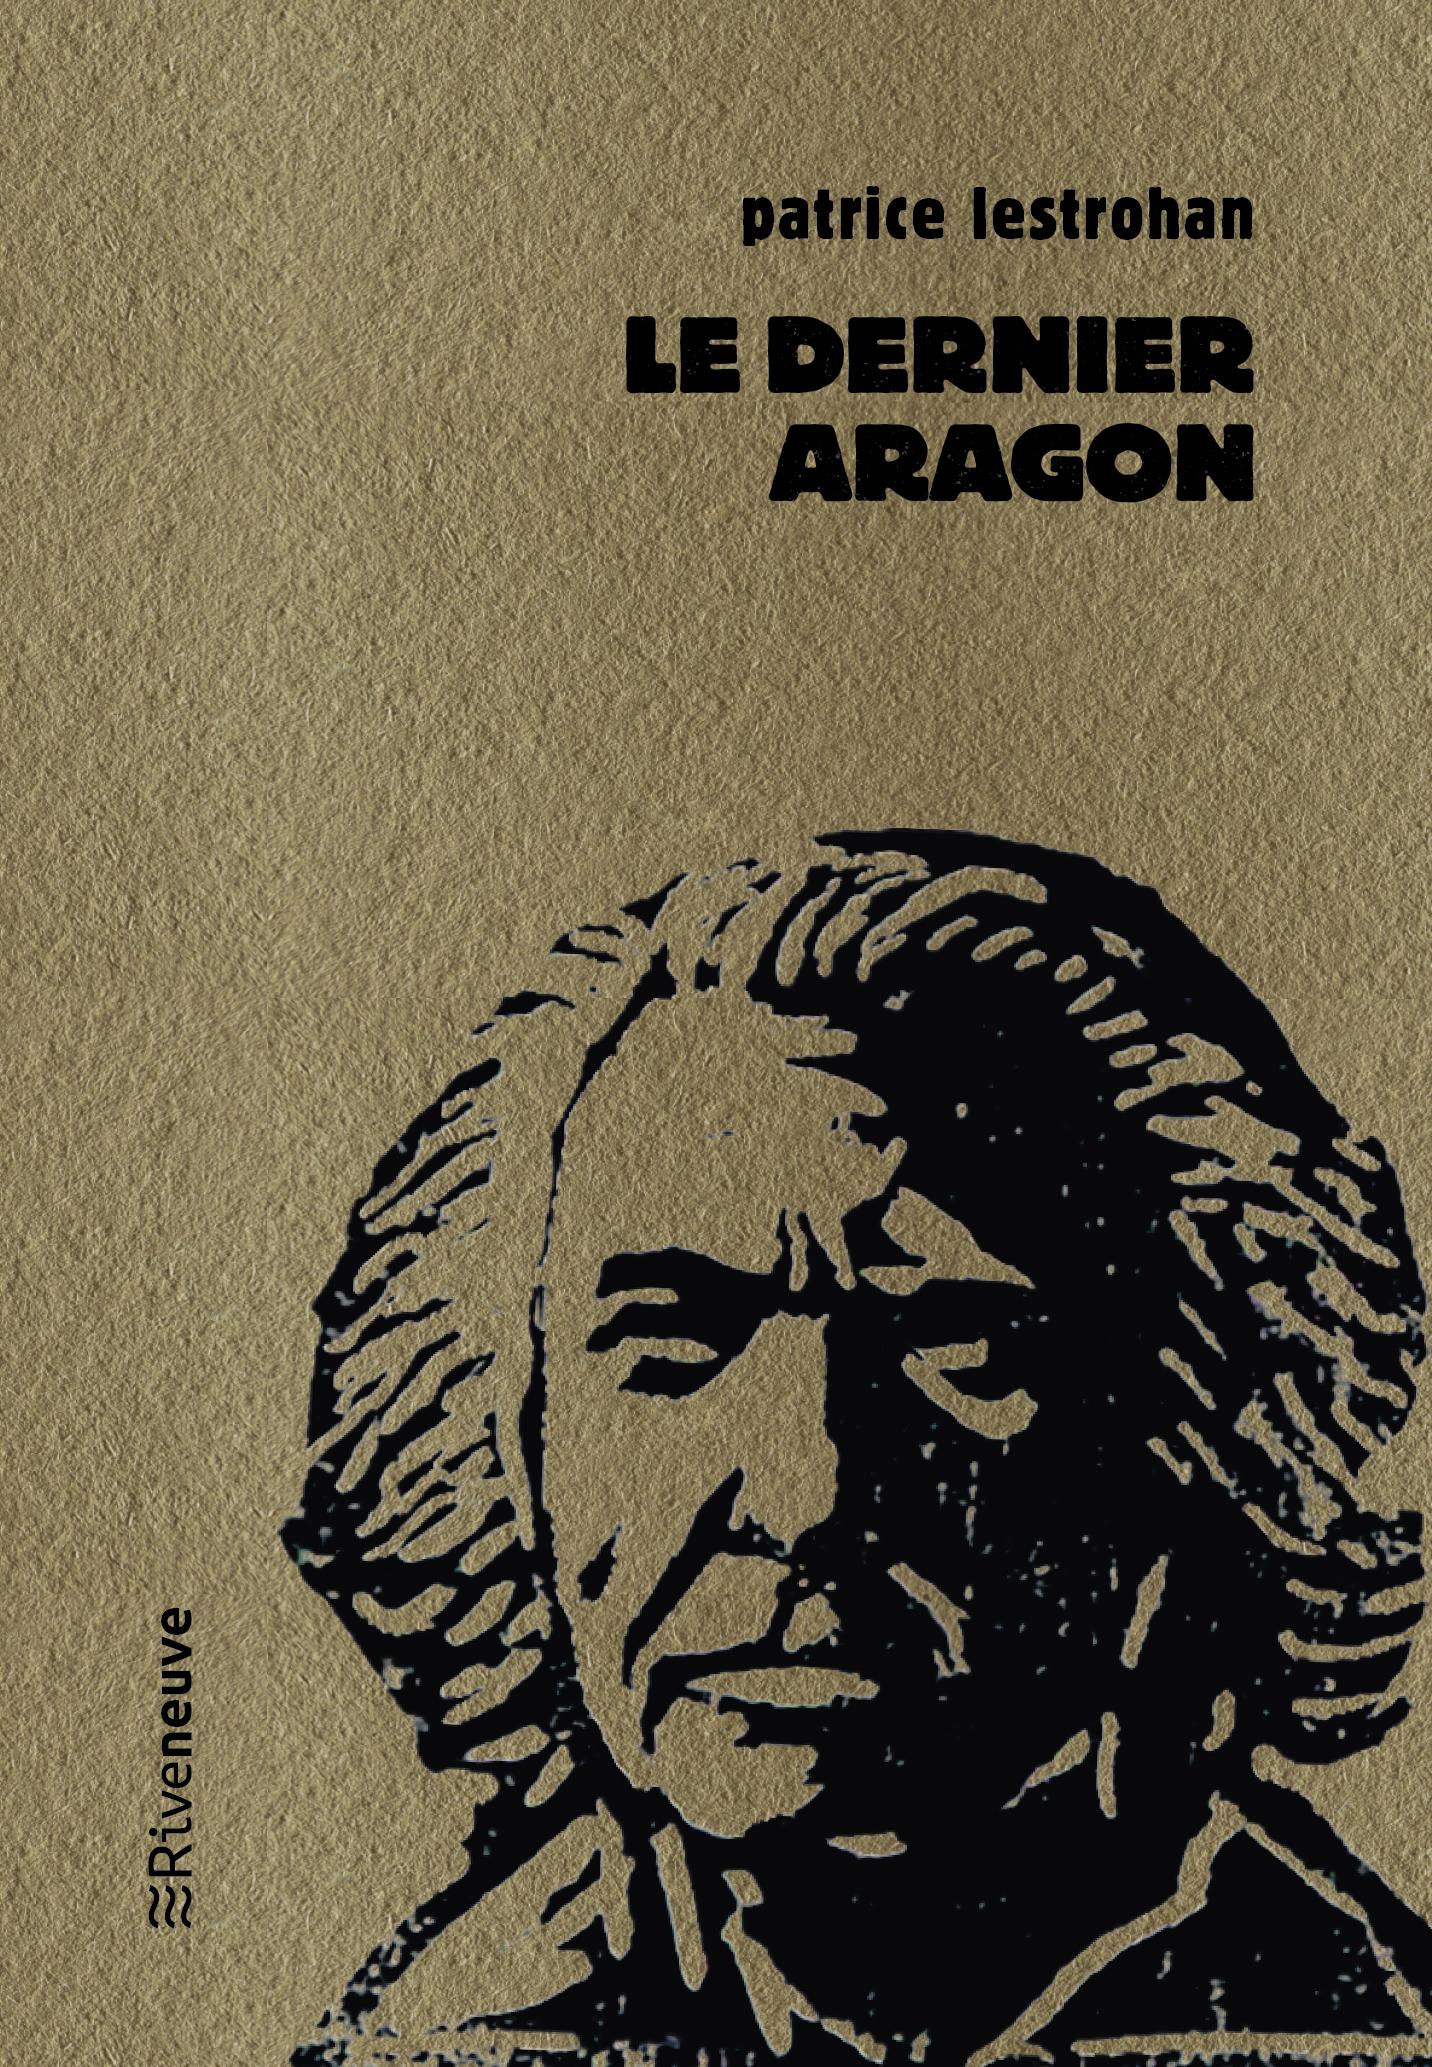 Le dernier Aragon